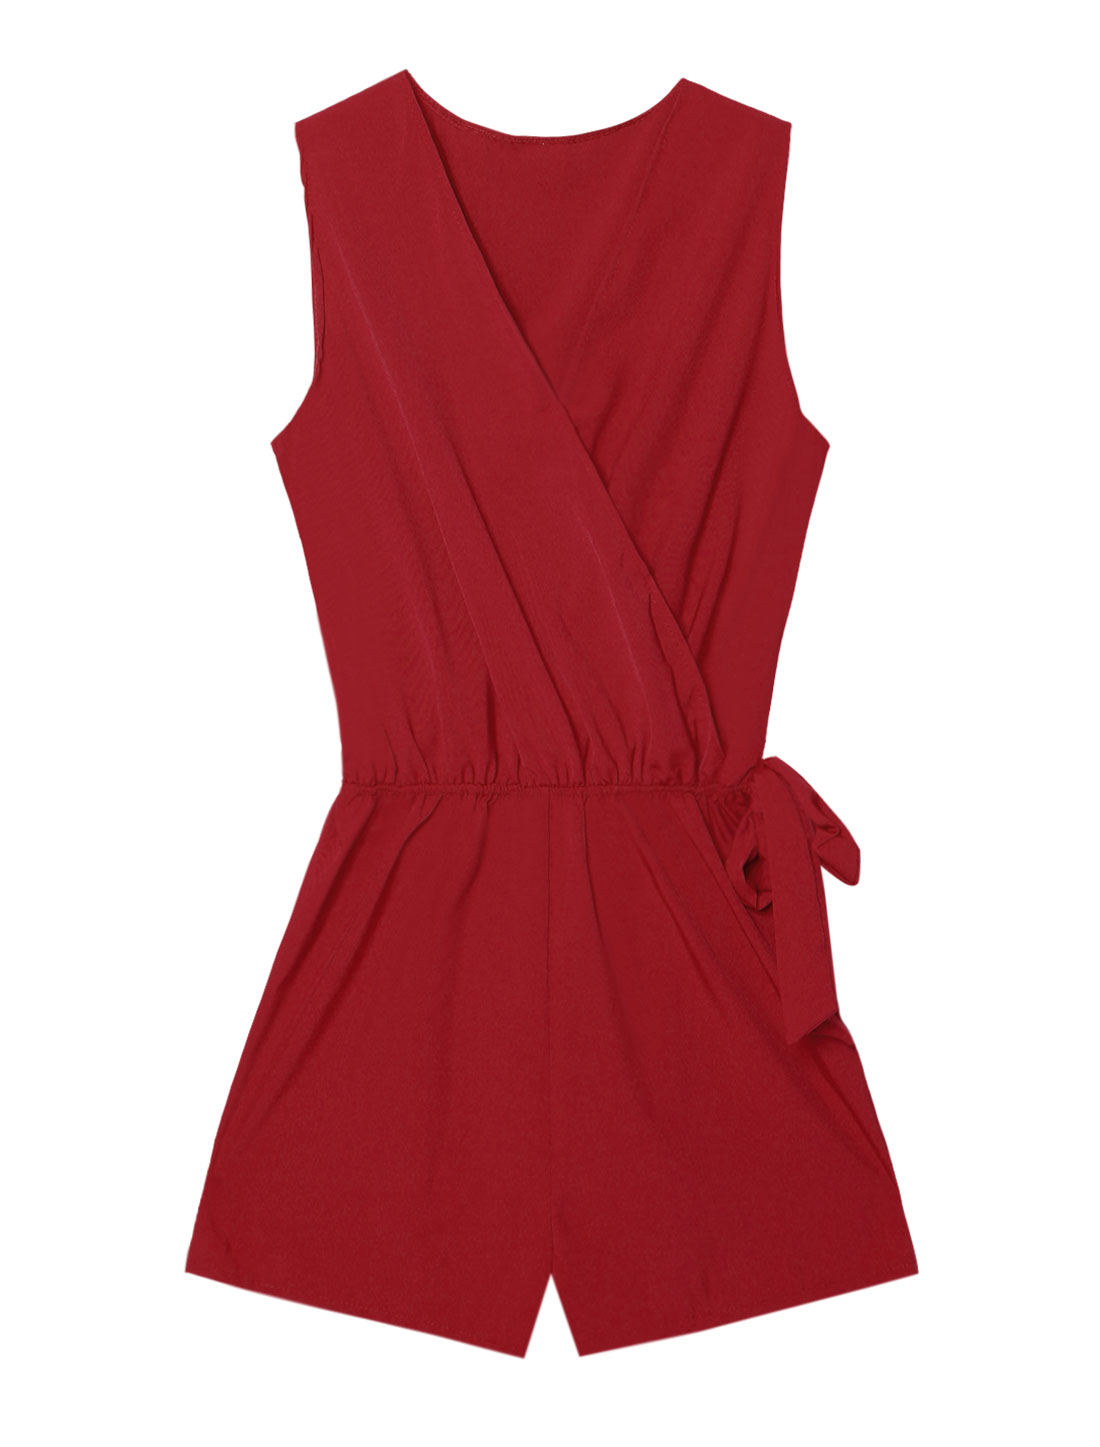 Women Crossover V Neck Self Tie Sleeveless Romper Red M